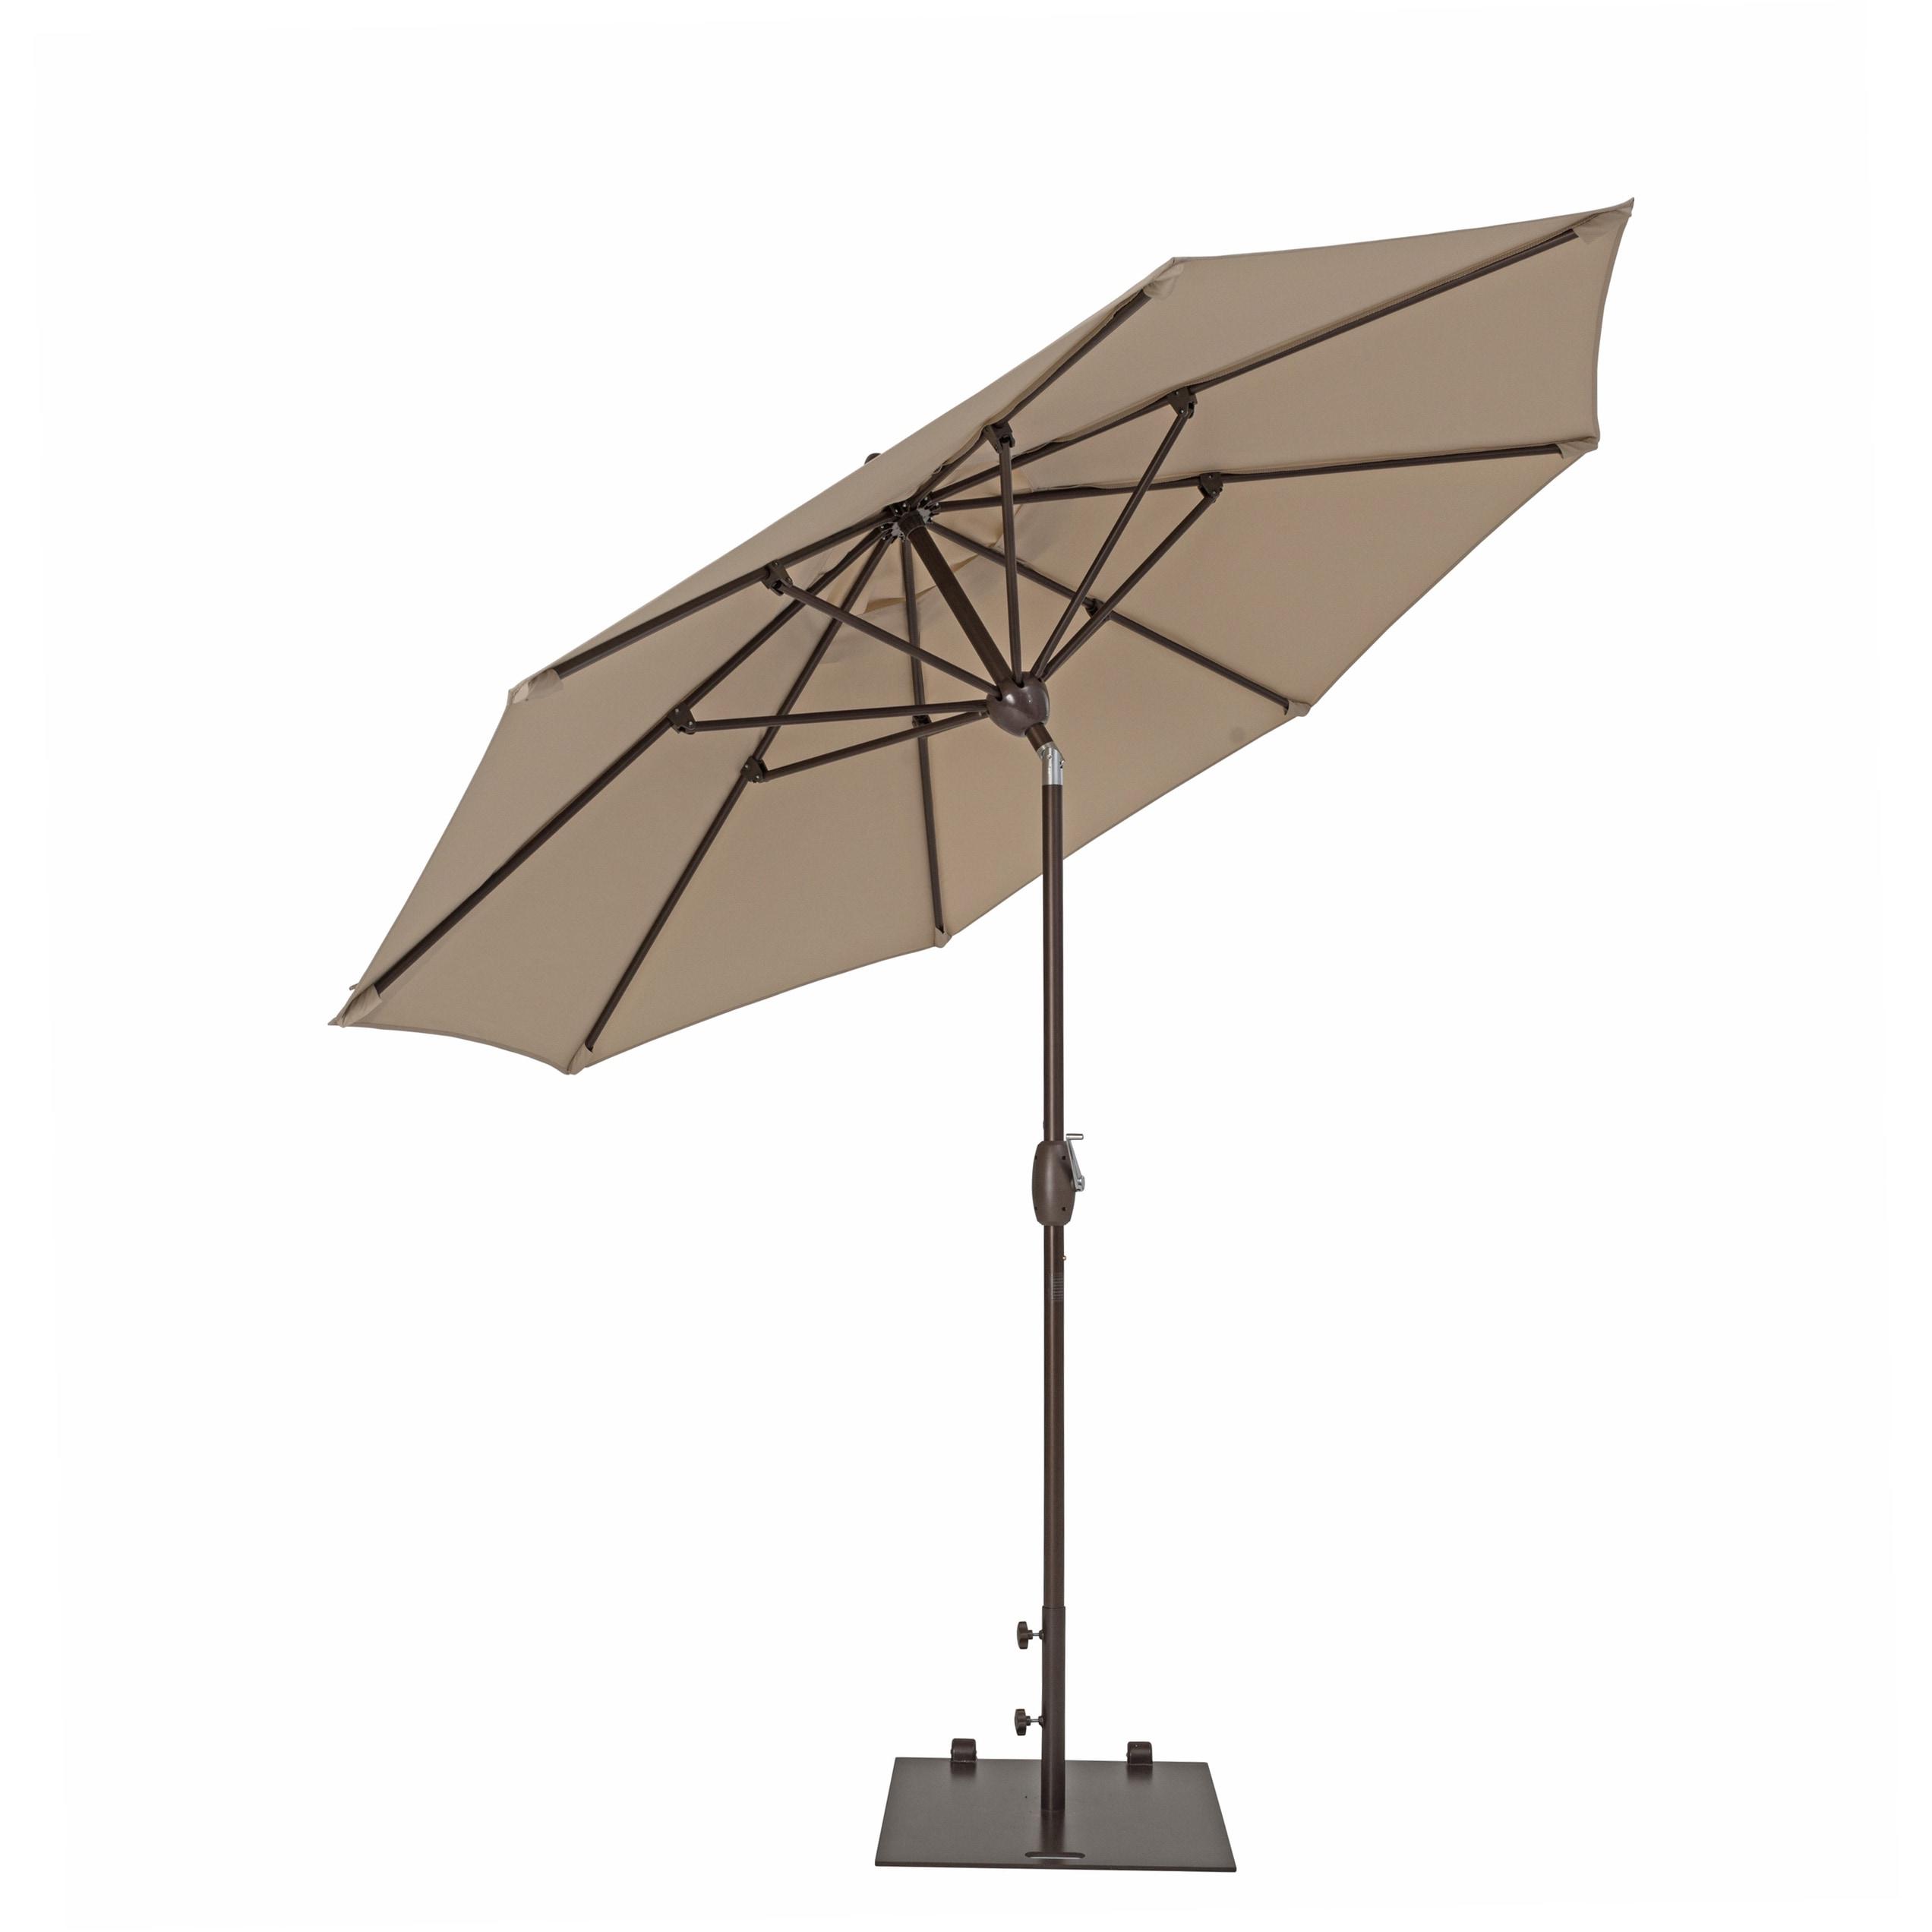 Dena Rectangular Market Umbrellas With Regard To 2020 Trueshade Plus 9 Foot Market Umbrella With Push Button Tilt (jockey (View 15 of 20)